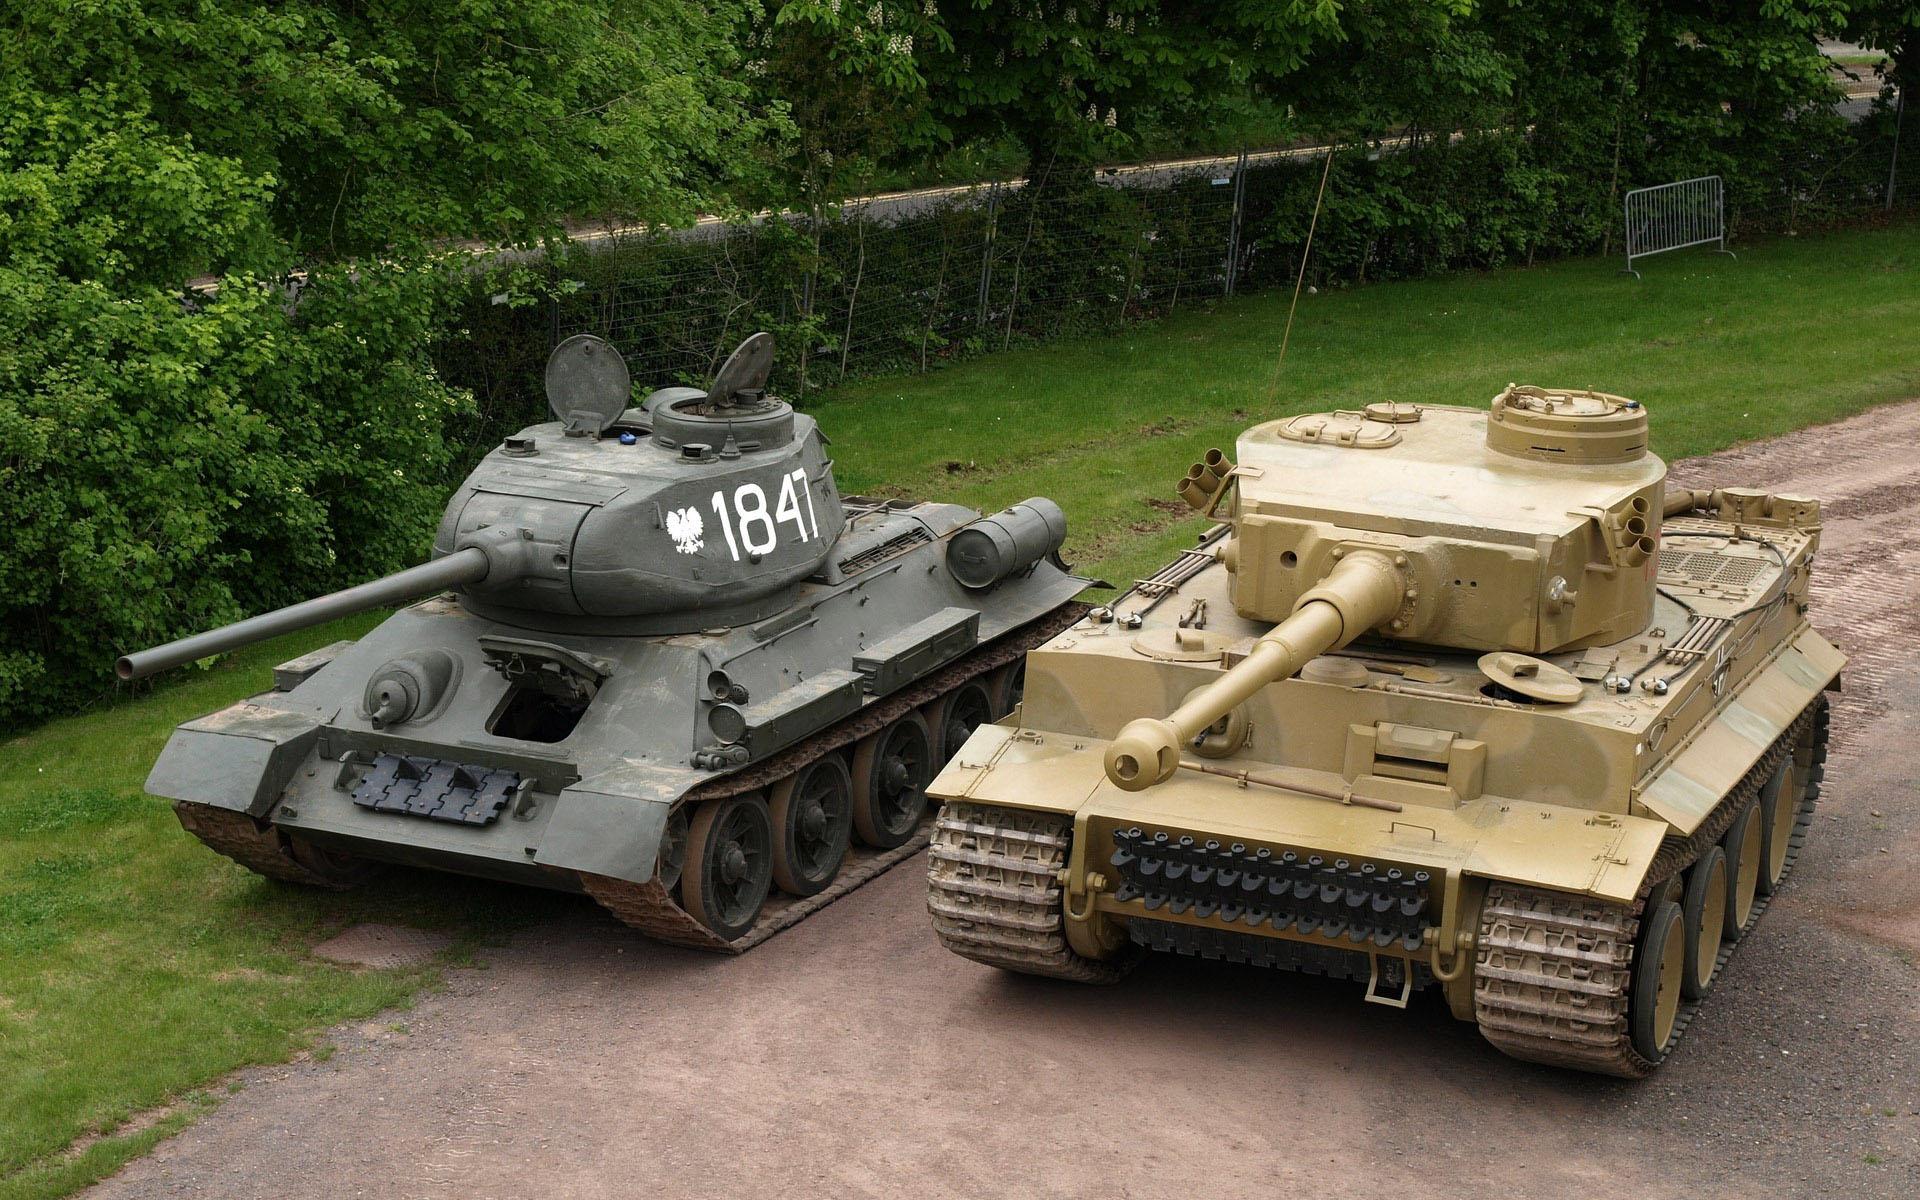 http://www.dfo-p.ru/uploadfiles/9.09.2012-tanki-T-34-85-i-Tigr-(PzKpfw-VI-Tiger).jpg